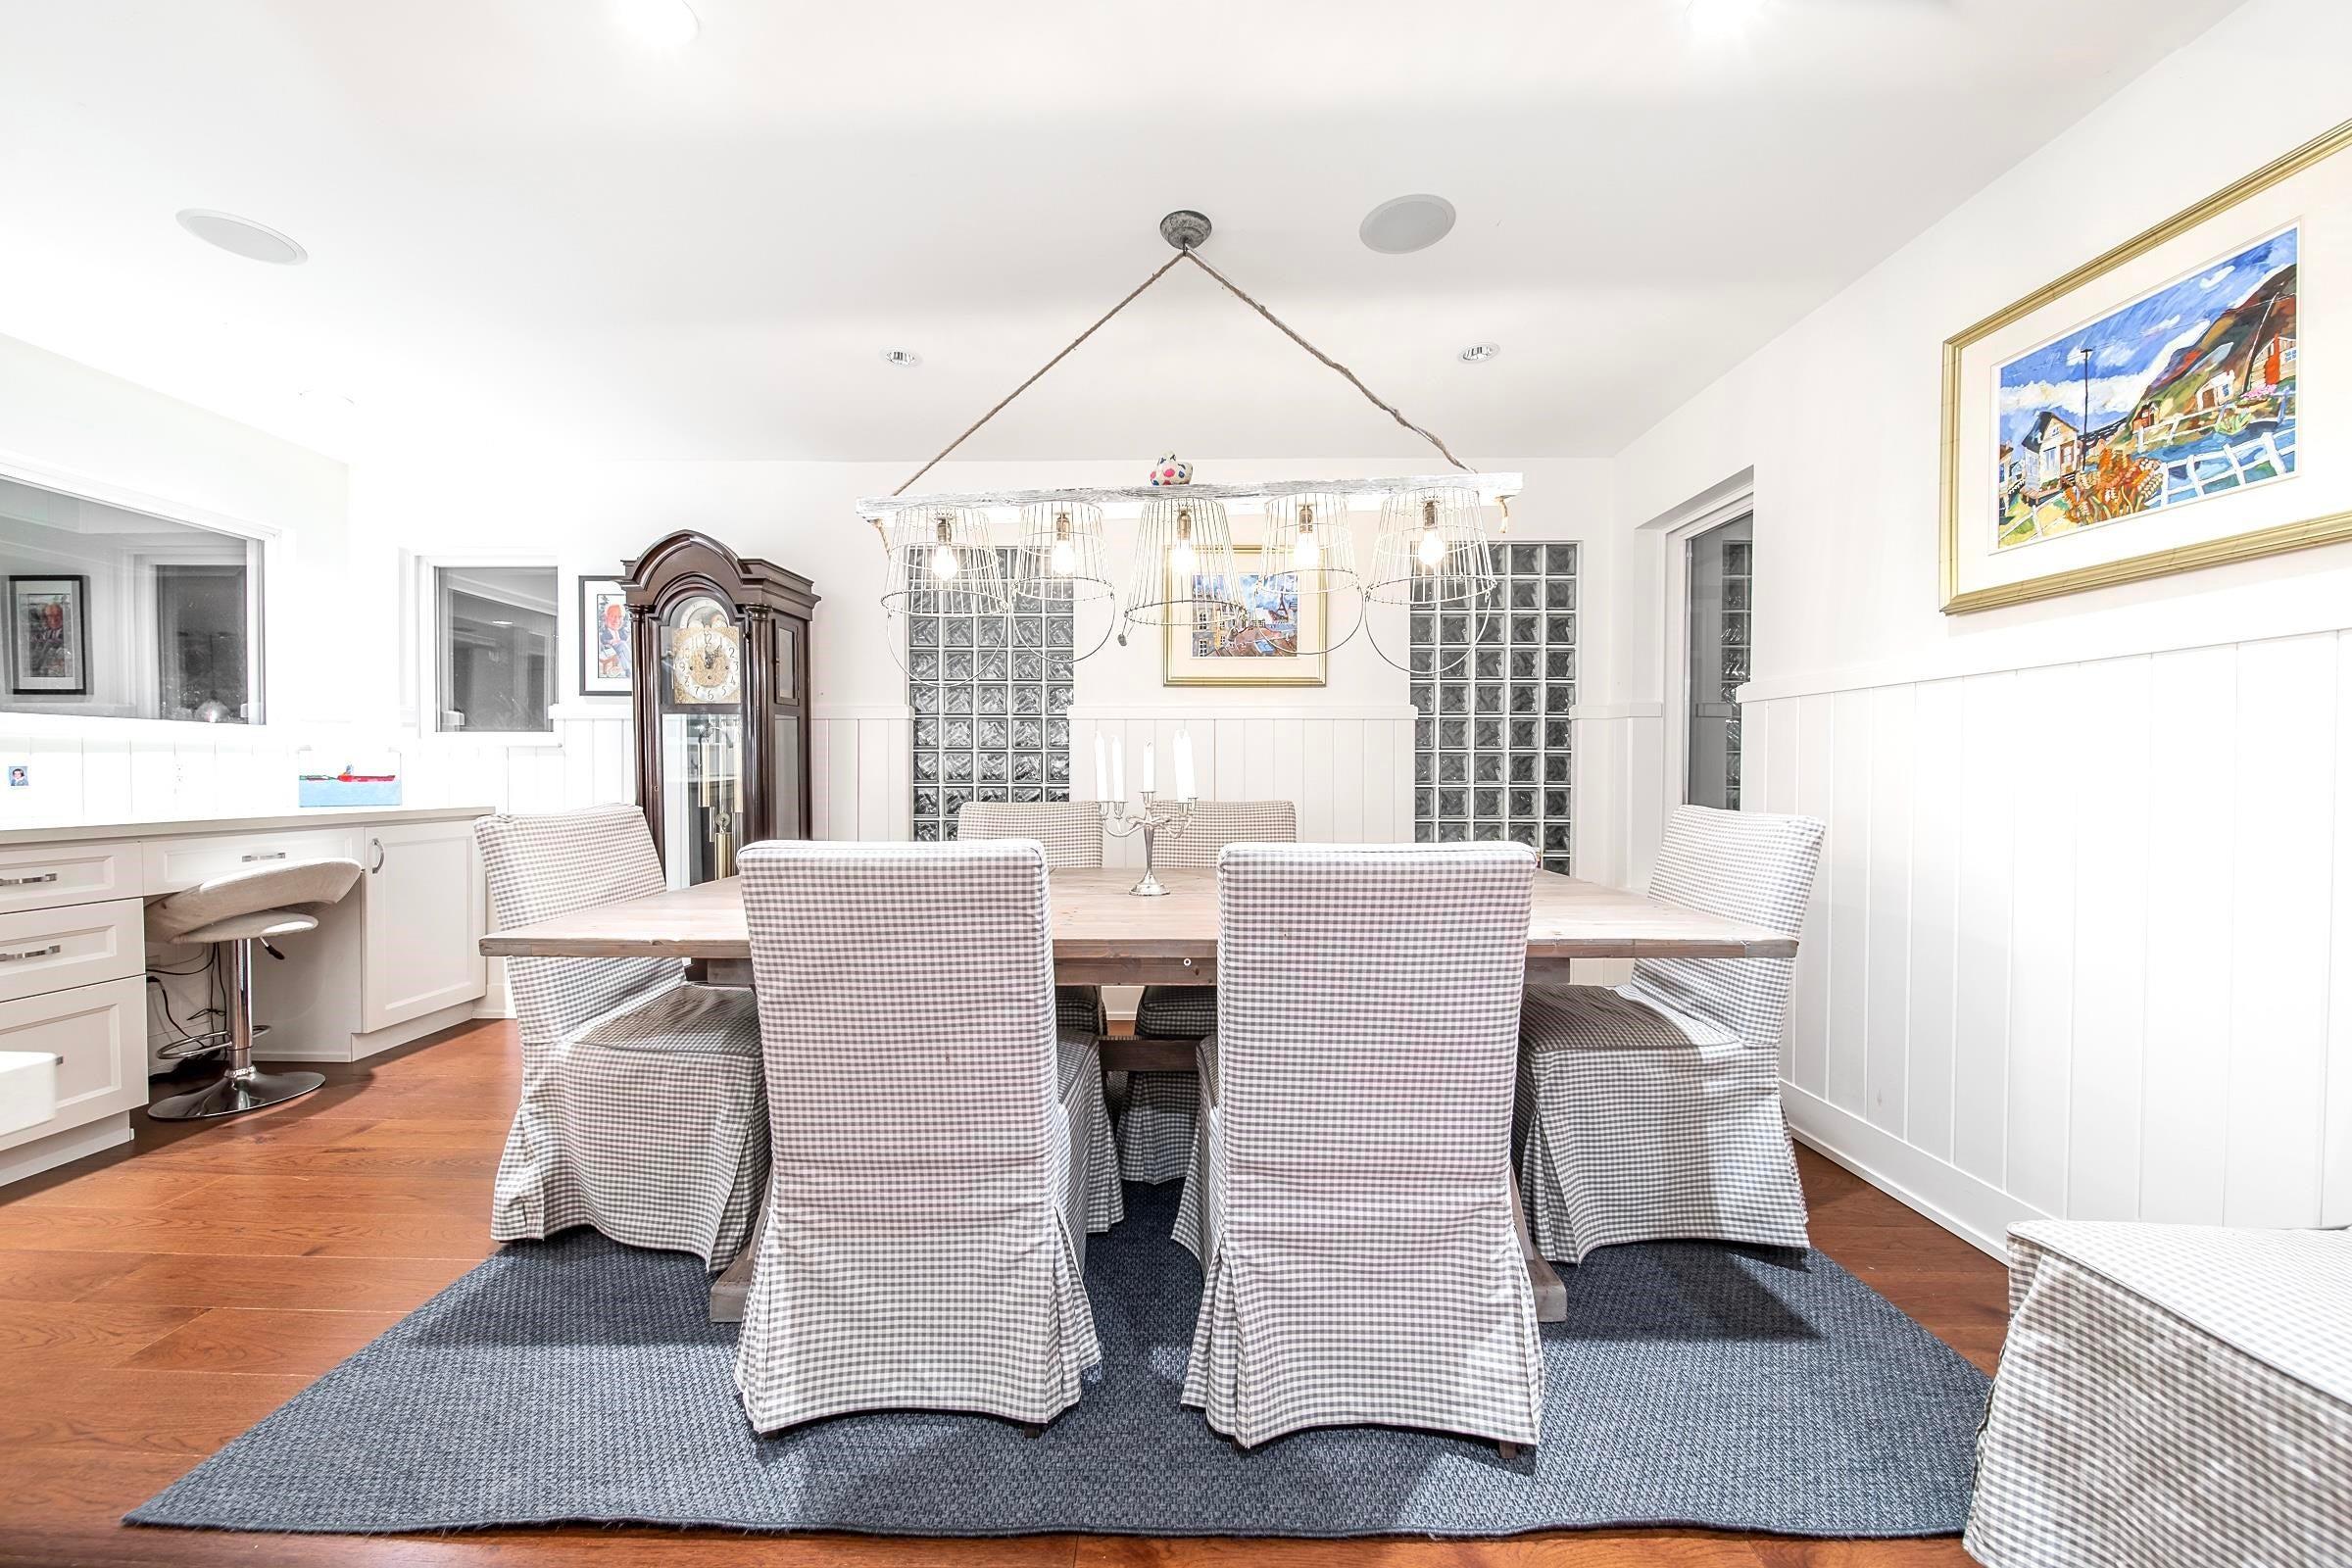 2321 MARINE DRIVE - Dundarave 1/2 Duplex for sale, 3 Bedrooms (R2617952) - #15